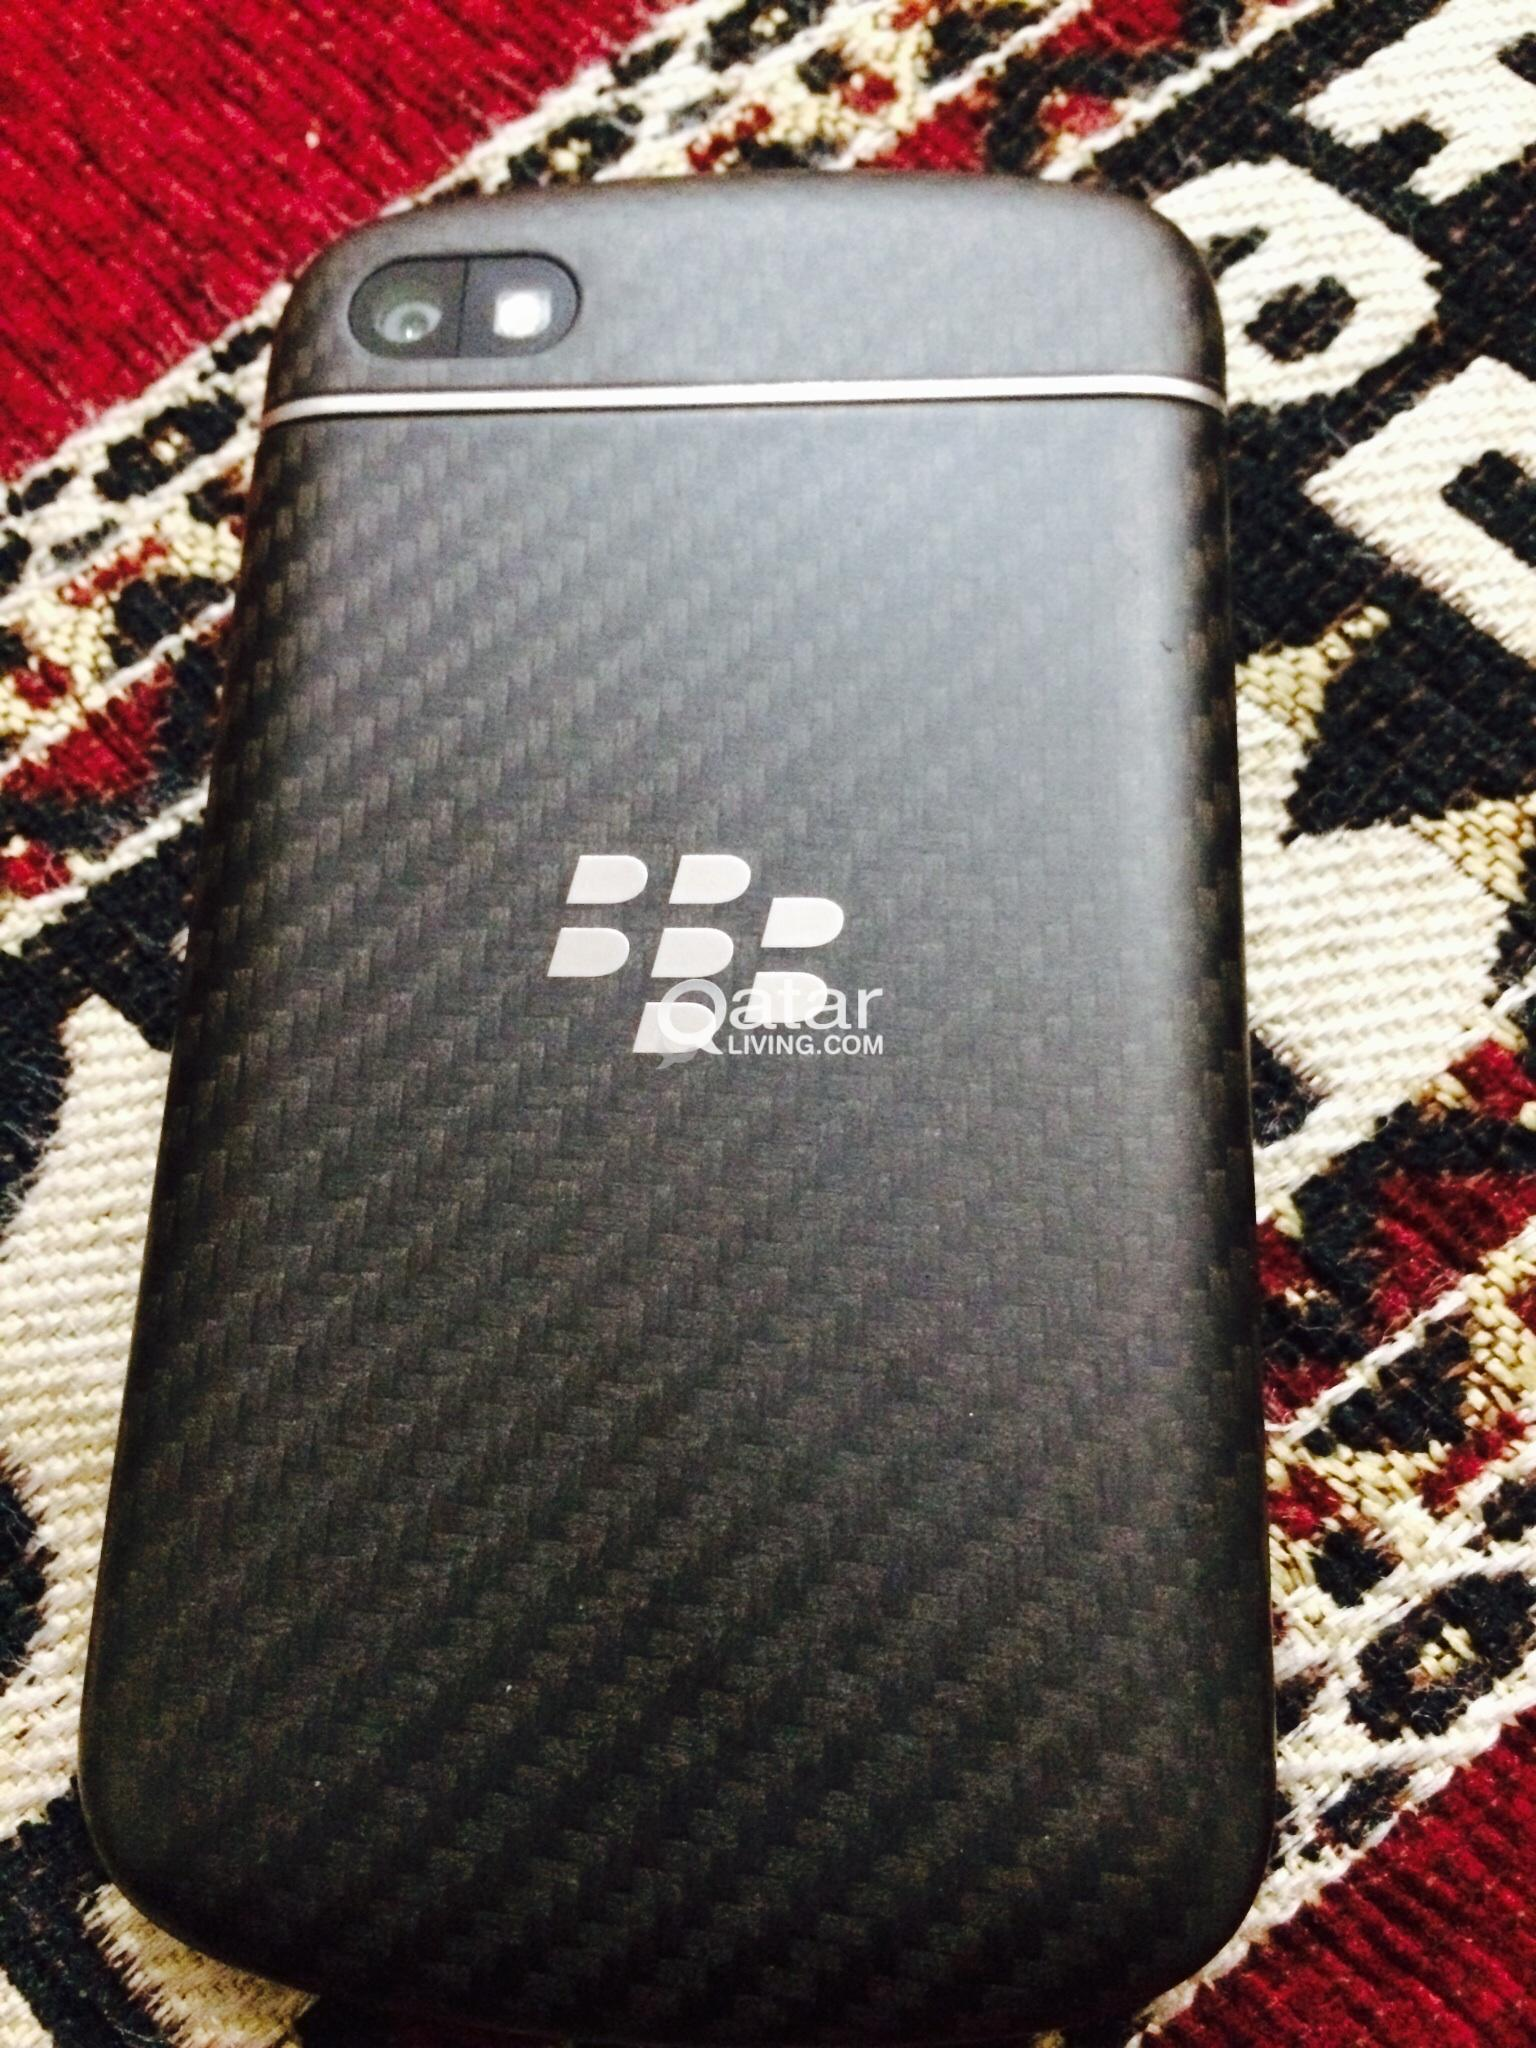 Blackberry Q10 Black Qatar Living Title